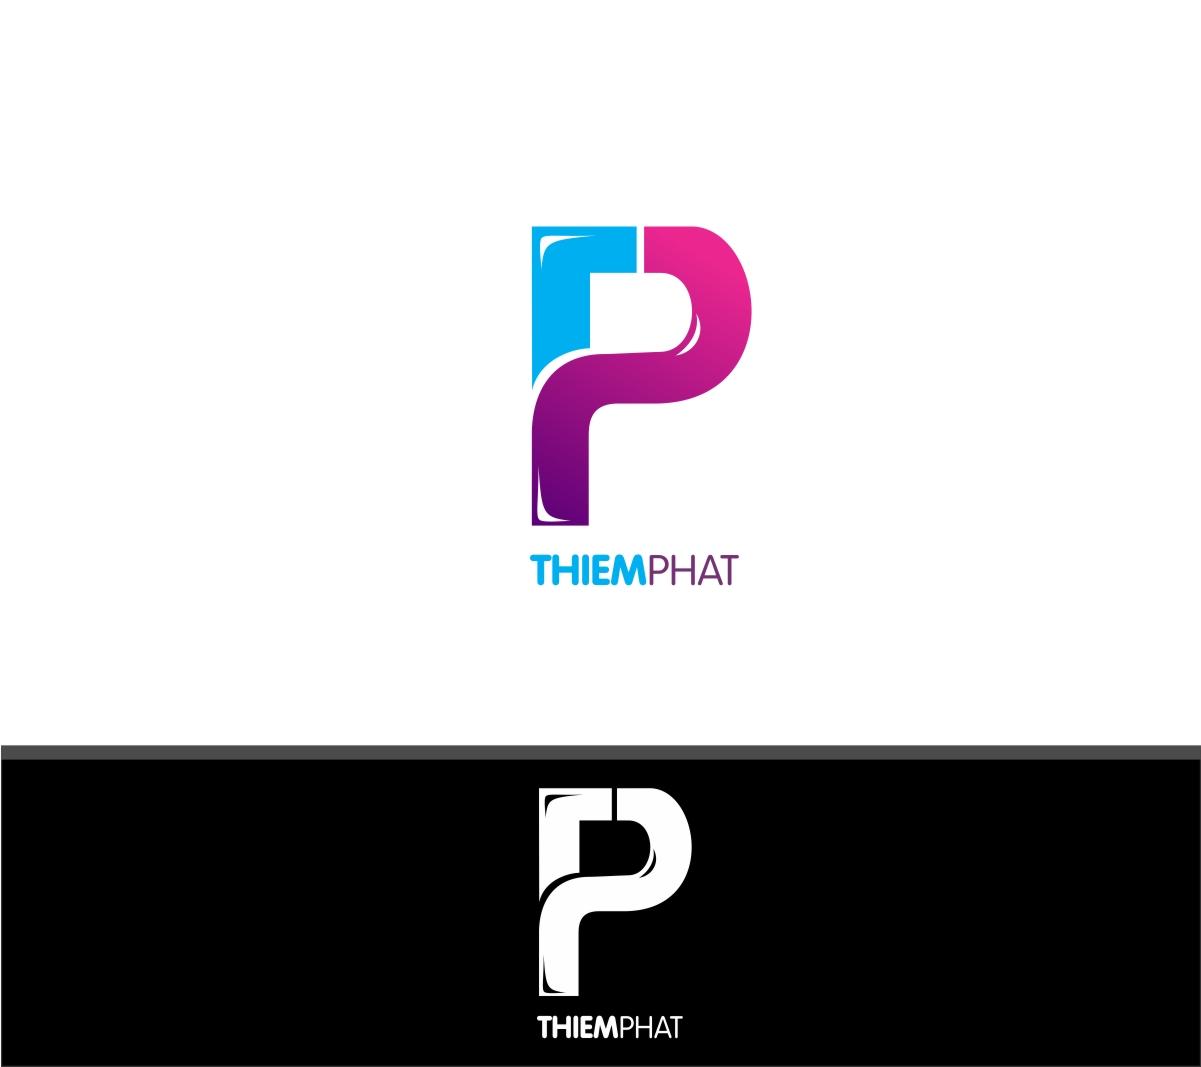 Logo Design by IDESIGNSTUDIO - Entry No. 123 in the Logo Design Contest New Logo Design for Thiem Phat company.